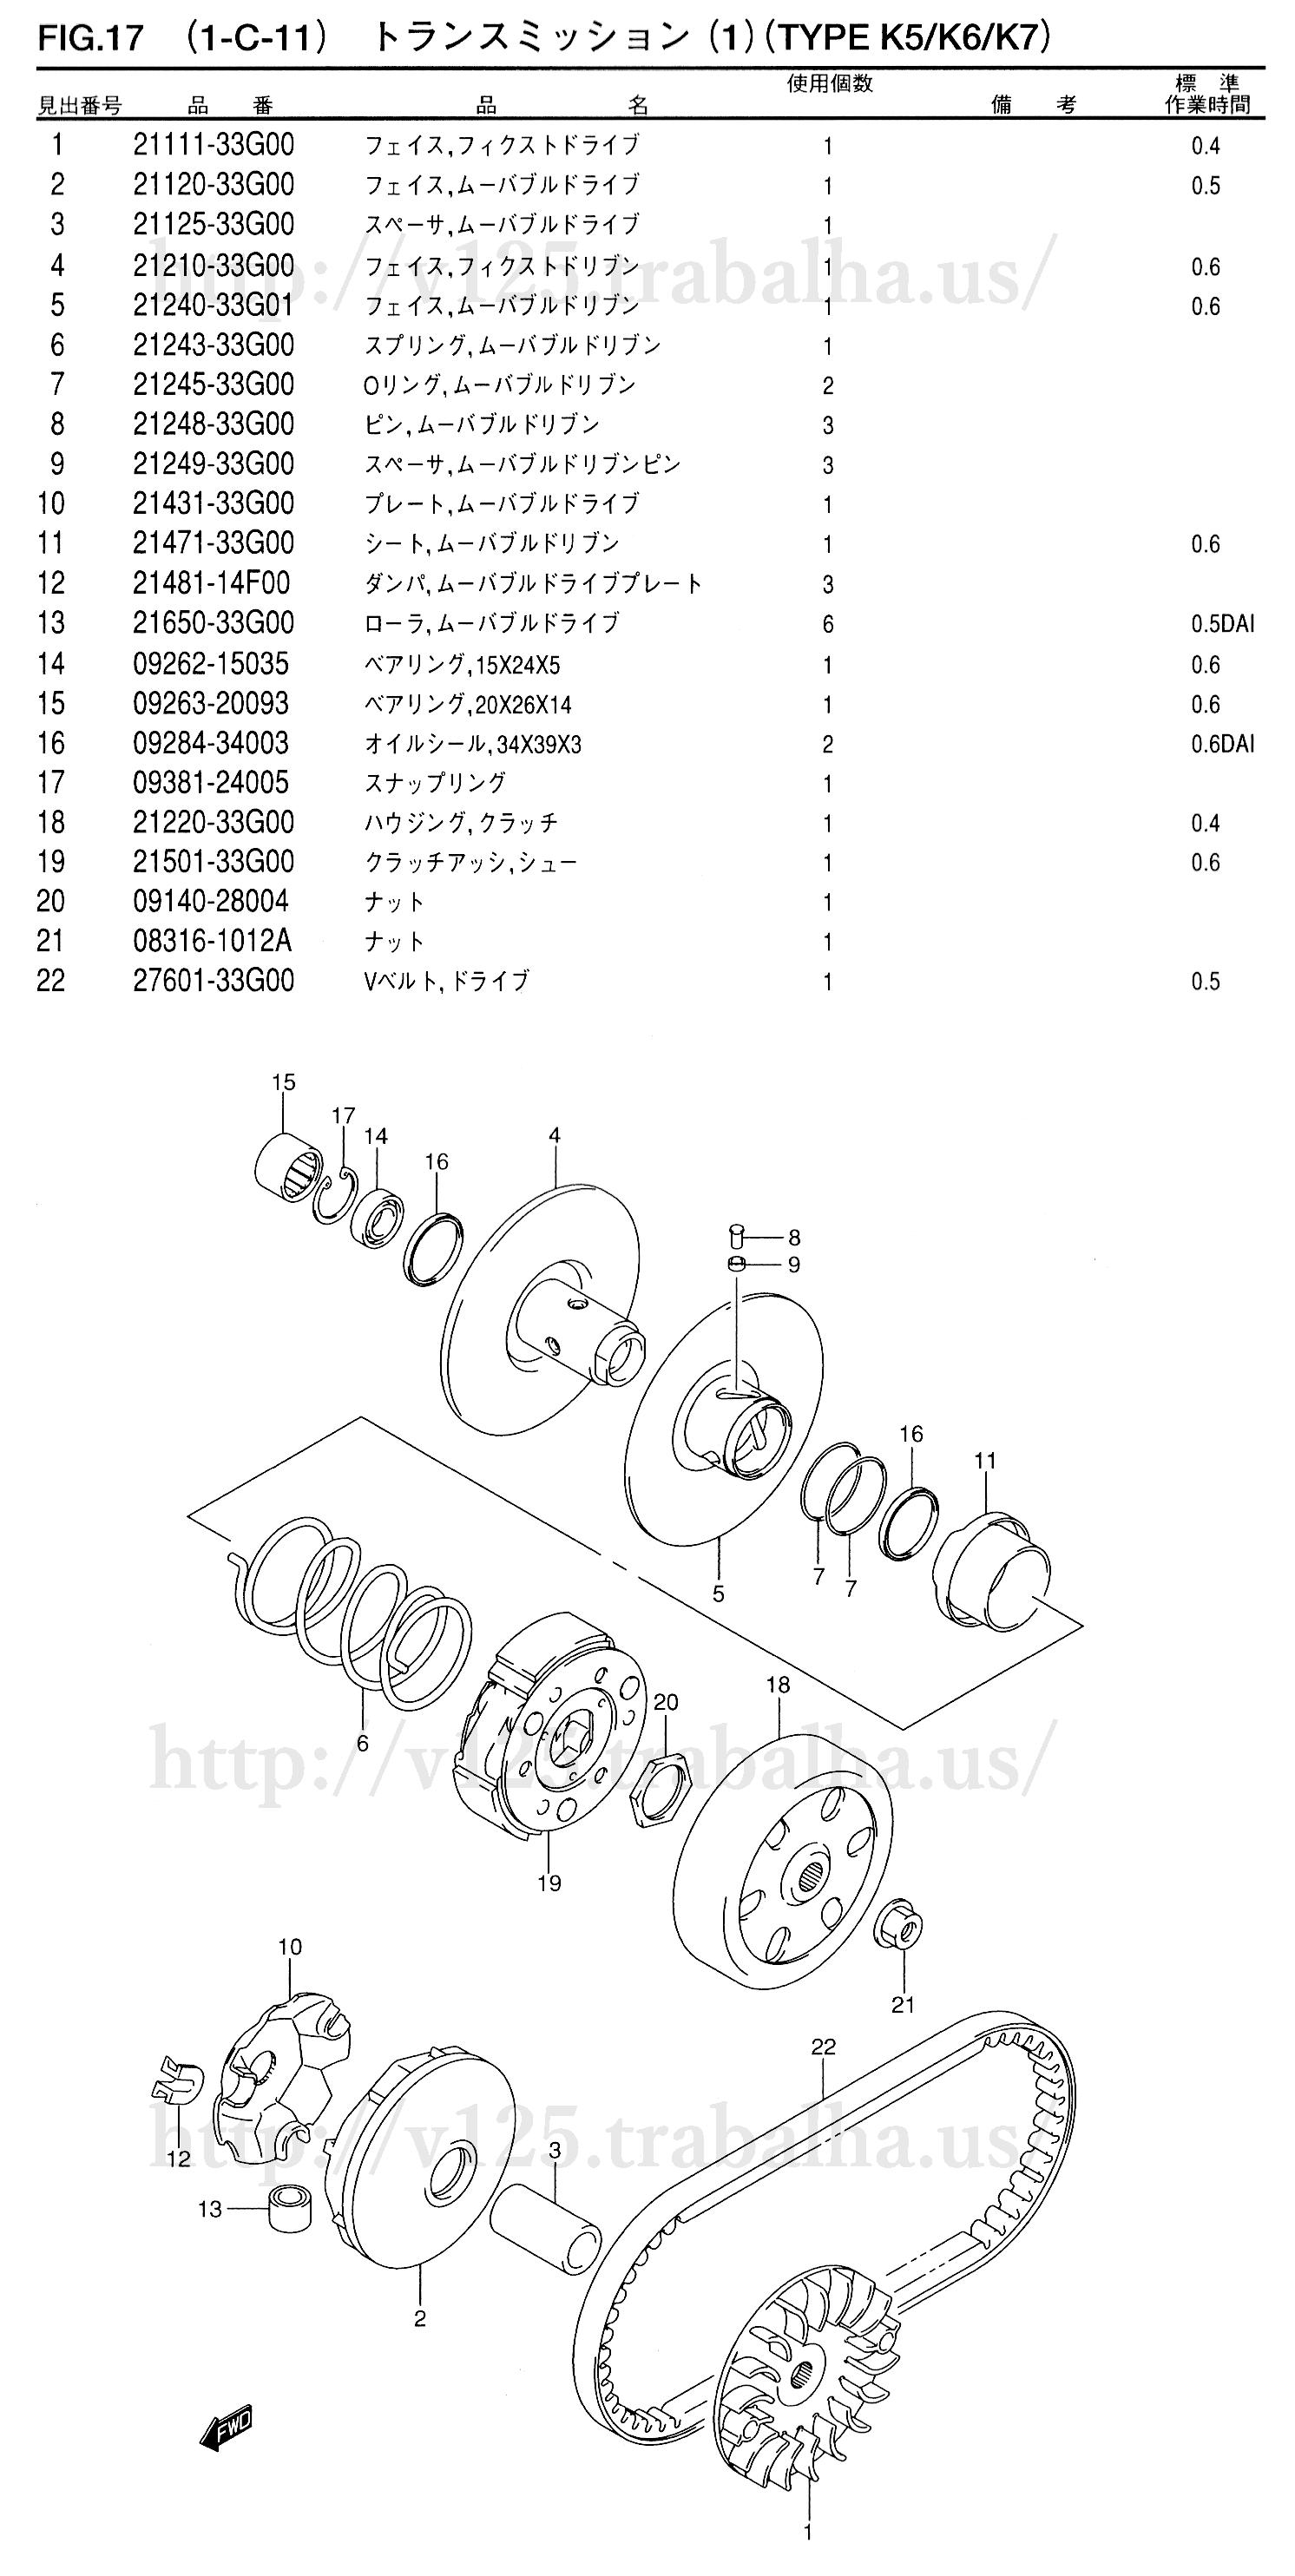 FIG.17(1-C-11) トランスミッション(1)(TYPE K5/K6/K7)